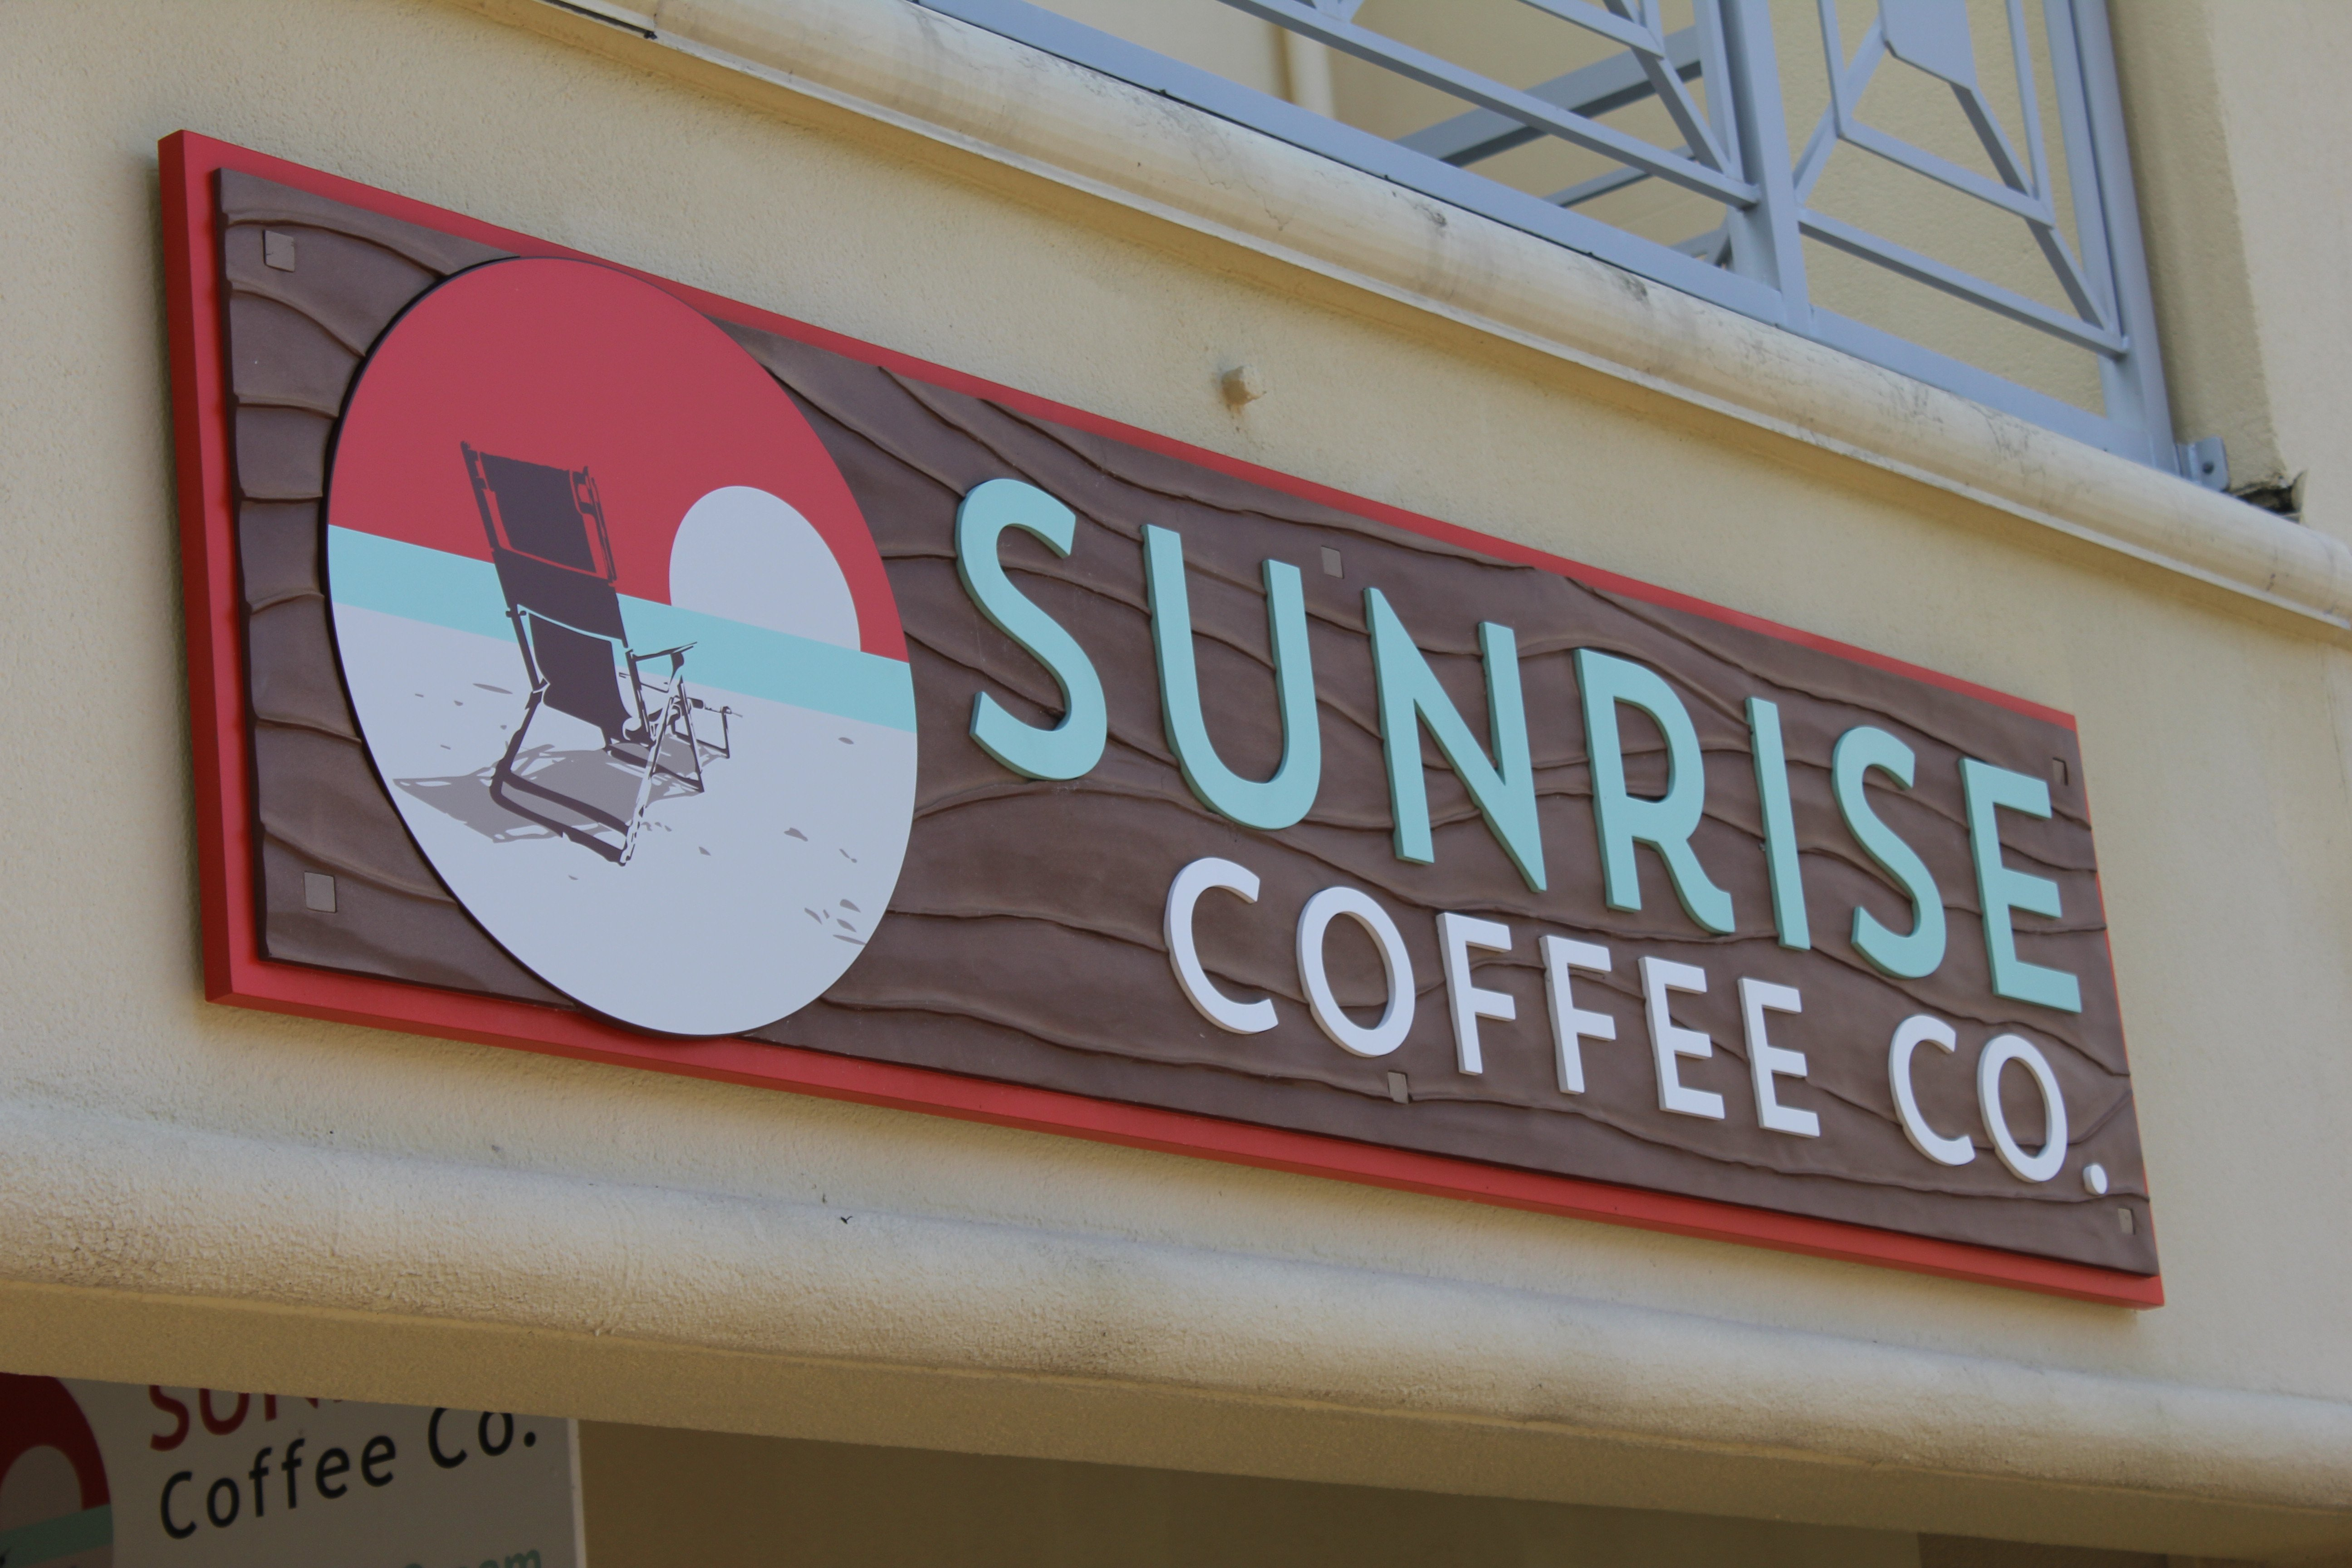 Sunrise Coffee Co. in Gulf Place